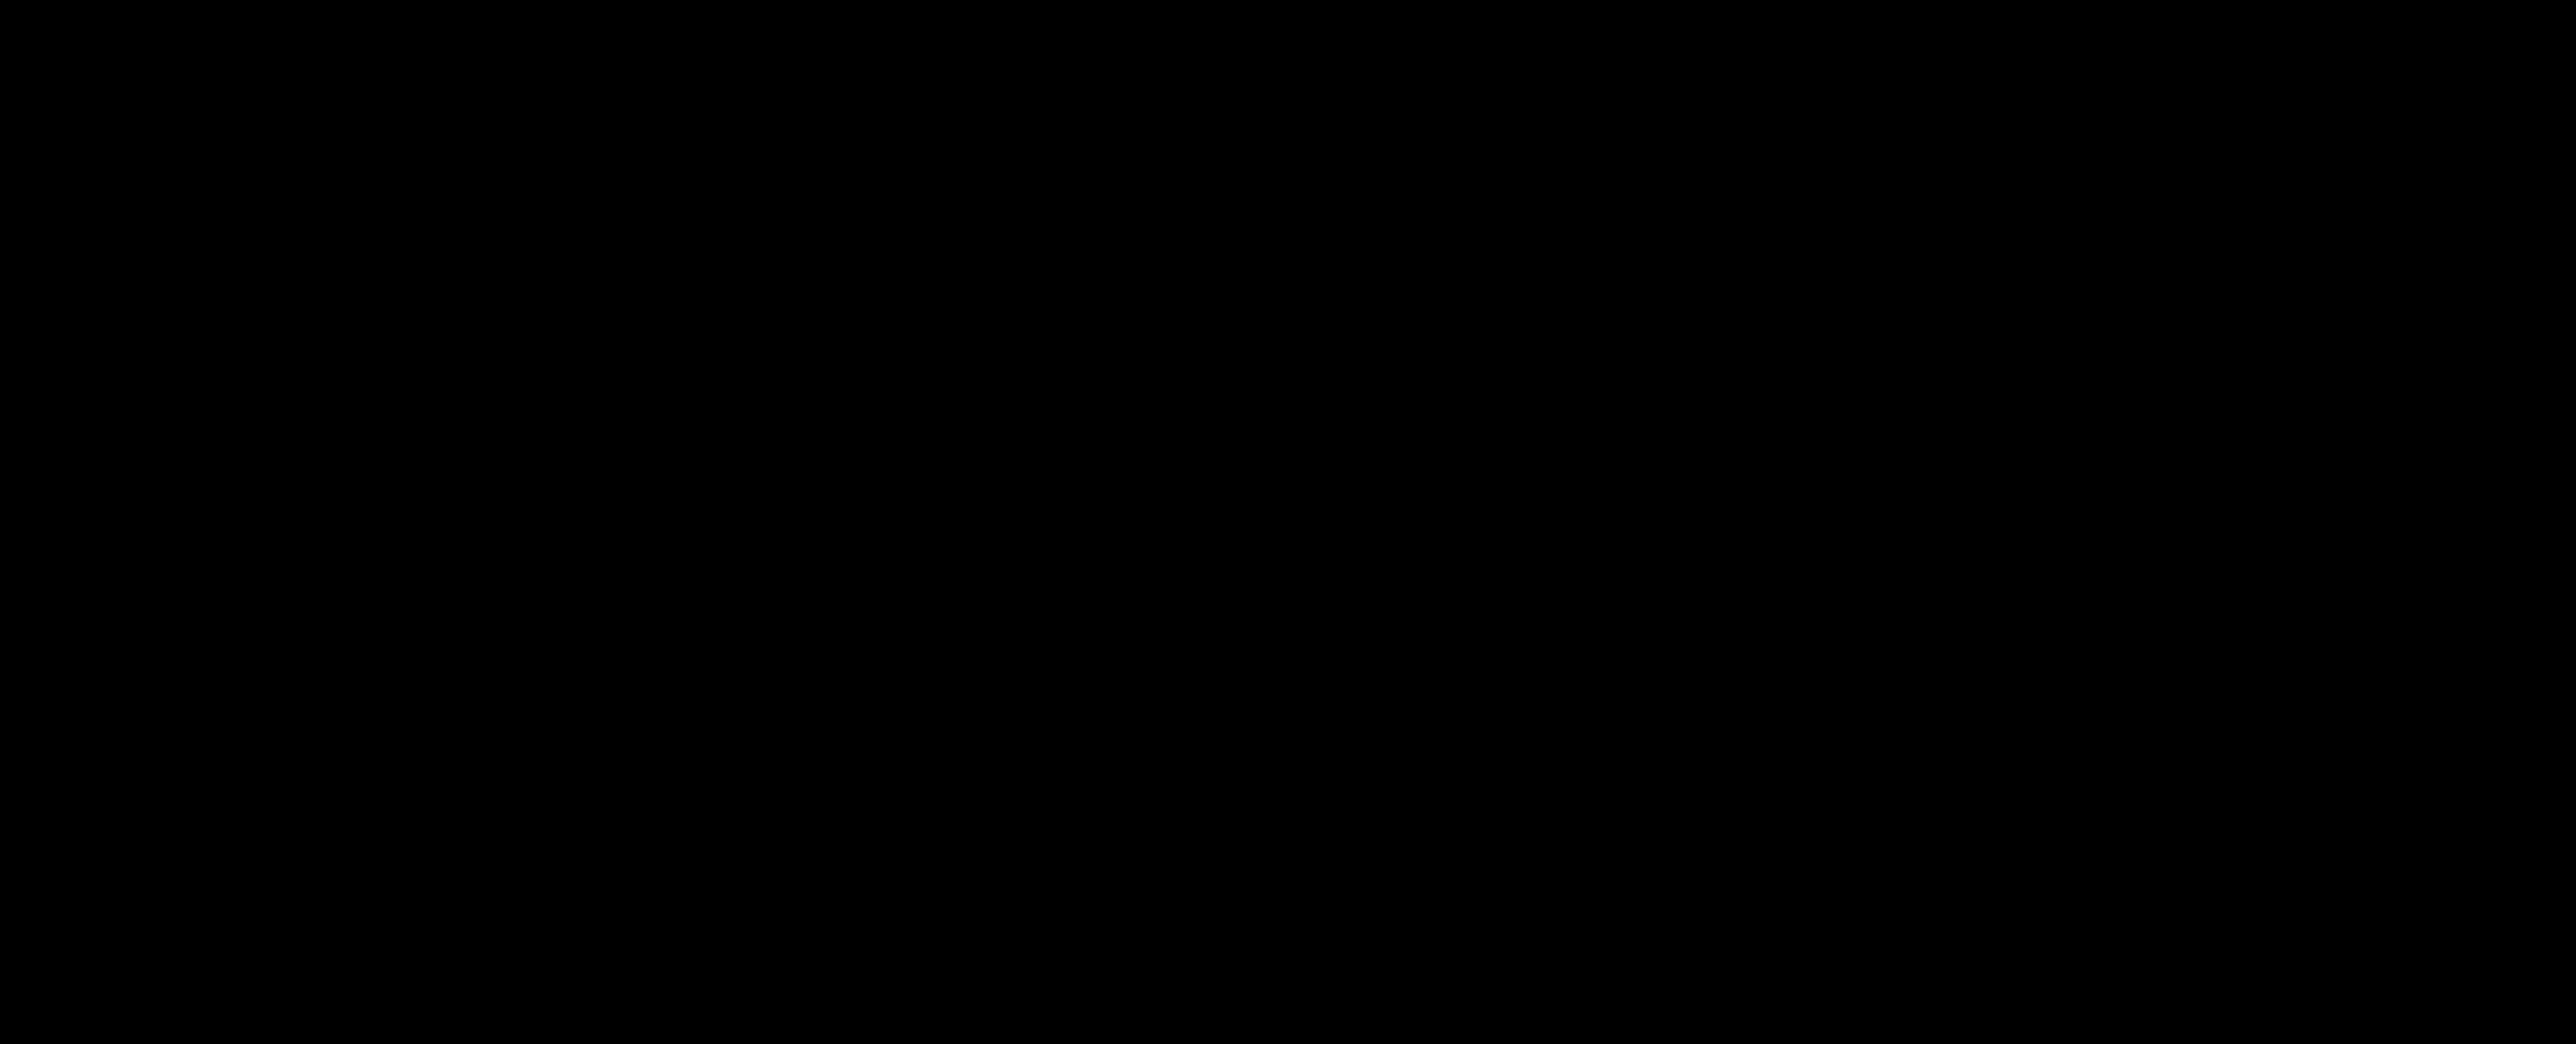 fondo-negro1